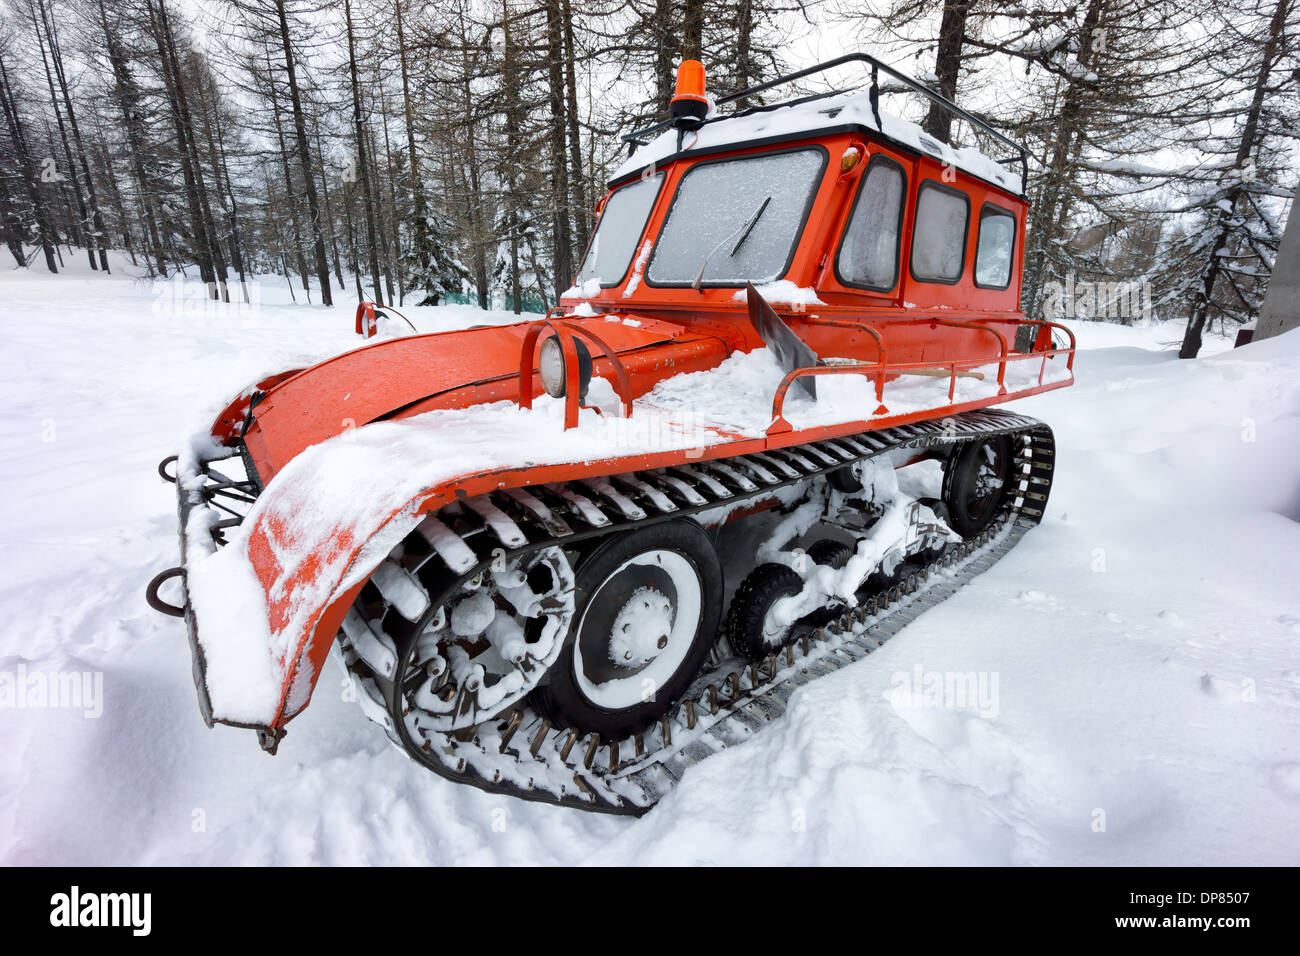 retro snow vehicle in mountain - Stock Image